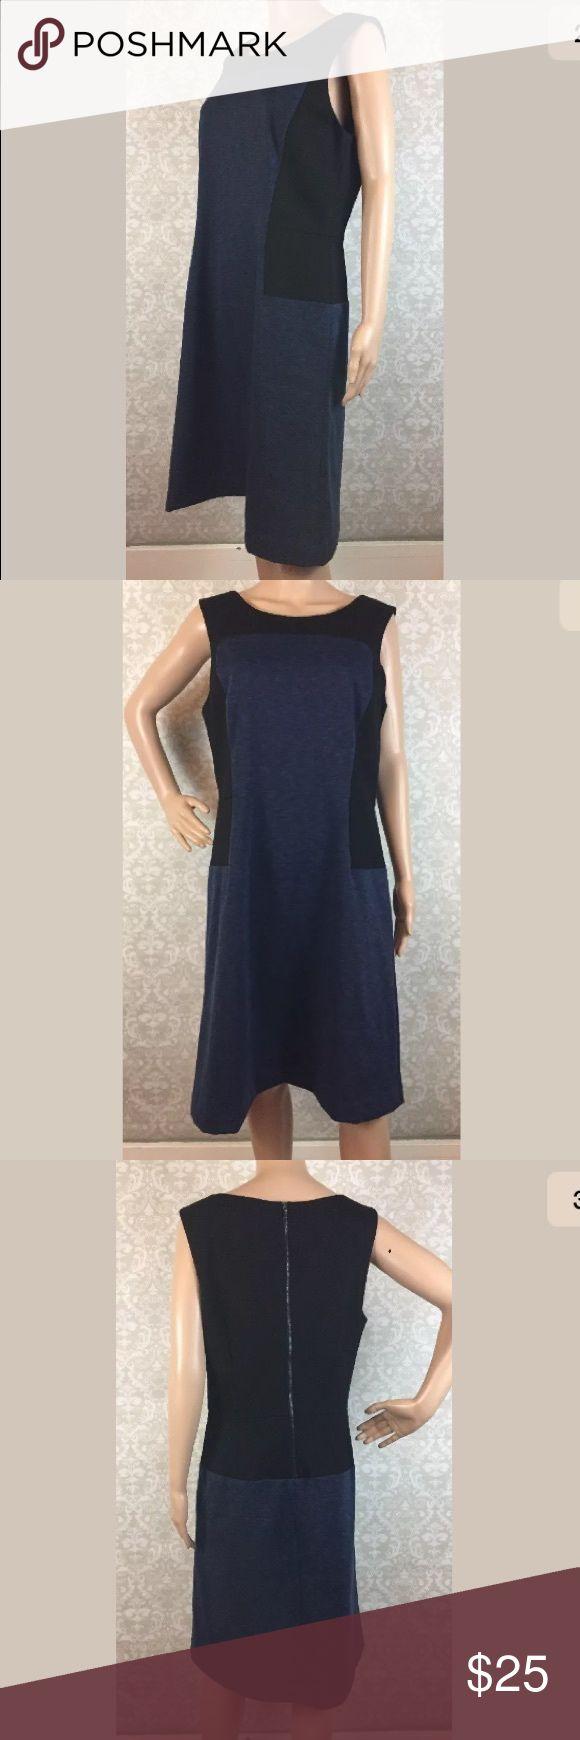 "Ann Taylor sleeveless colorblock dress Gently used Ann Taylor colorblock sleeveless dress, size 12.   Armpit to armpit-19.5""  Armpit to hem-30.5"" Ann Taylor Dresses"